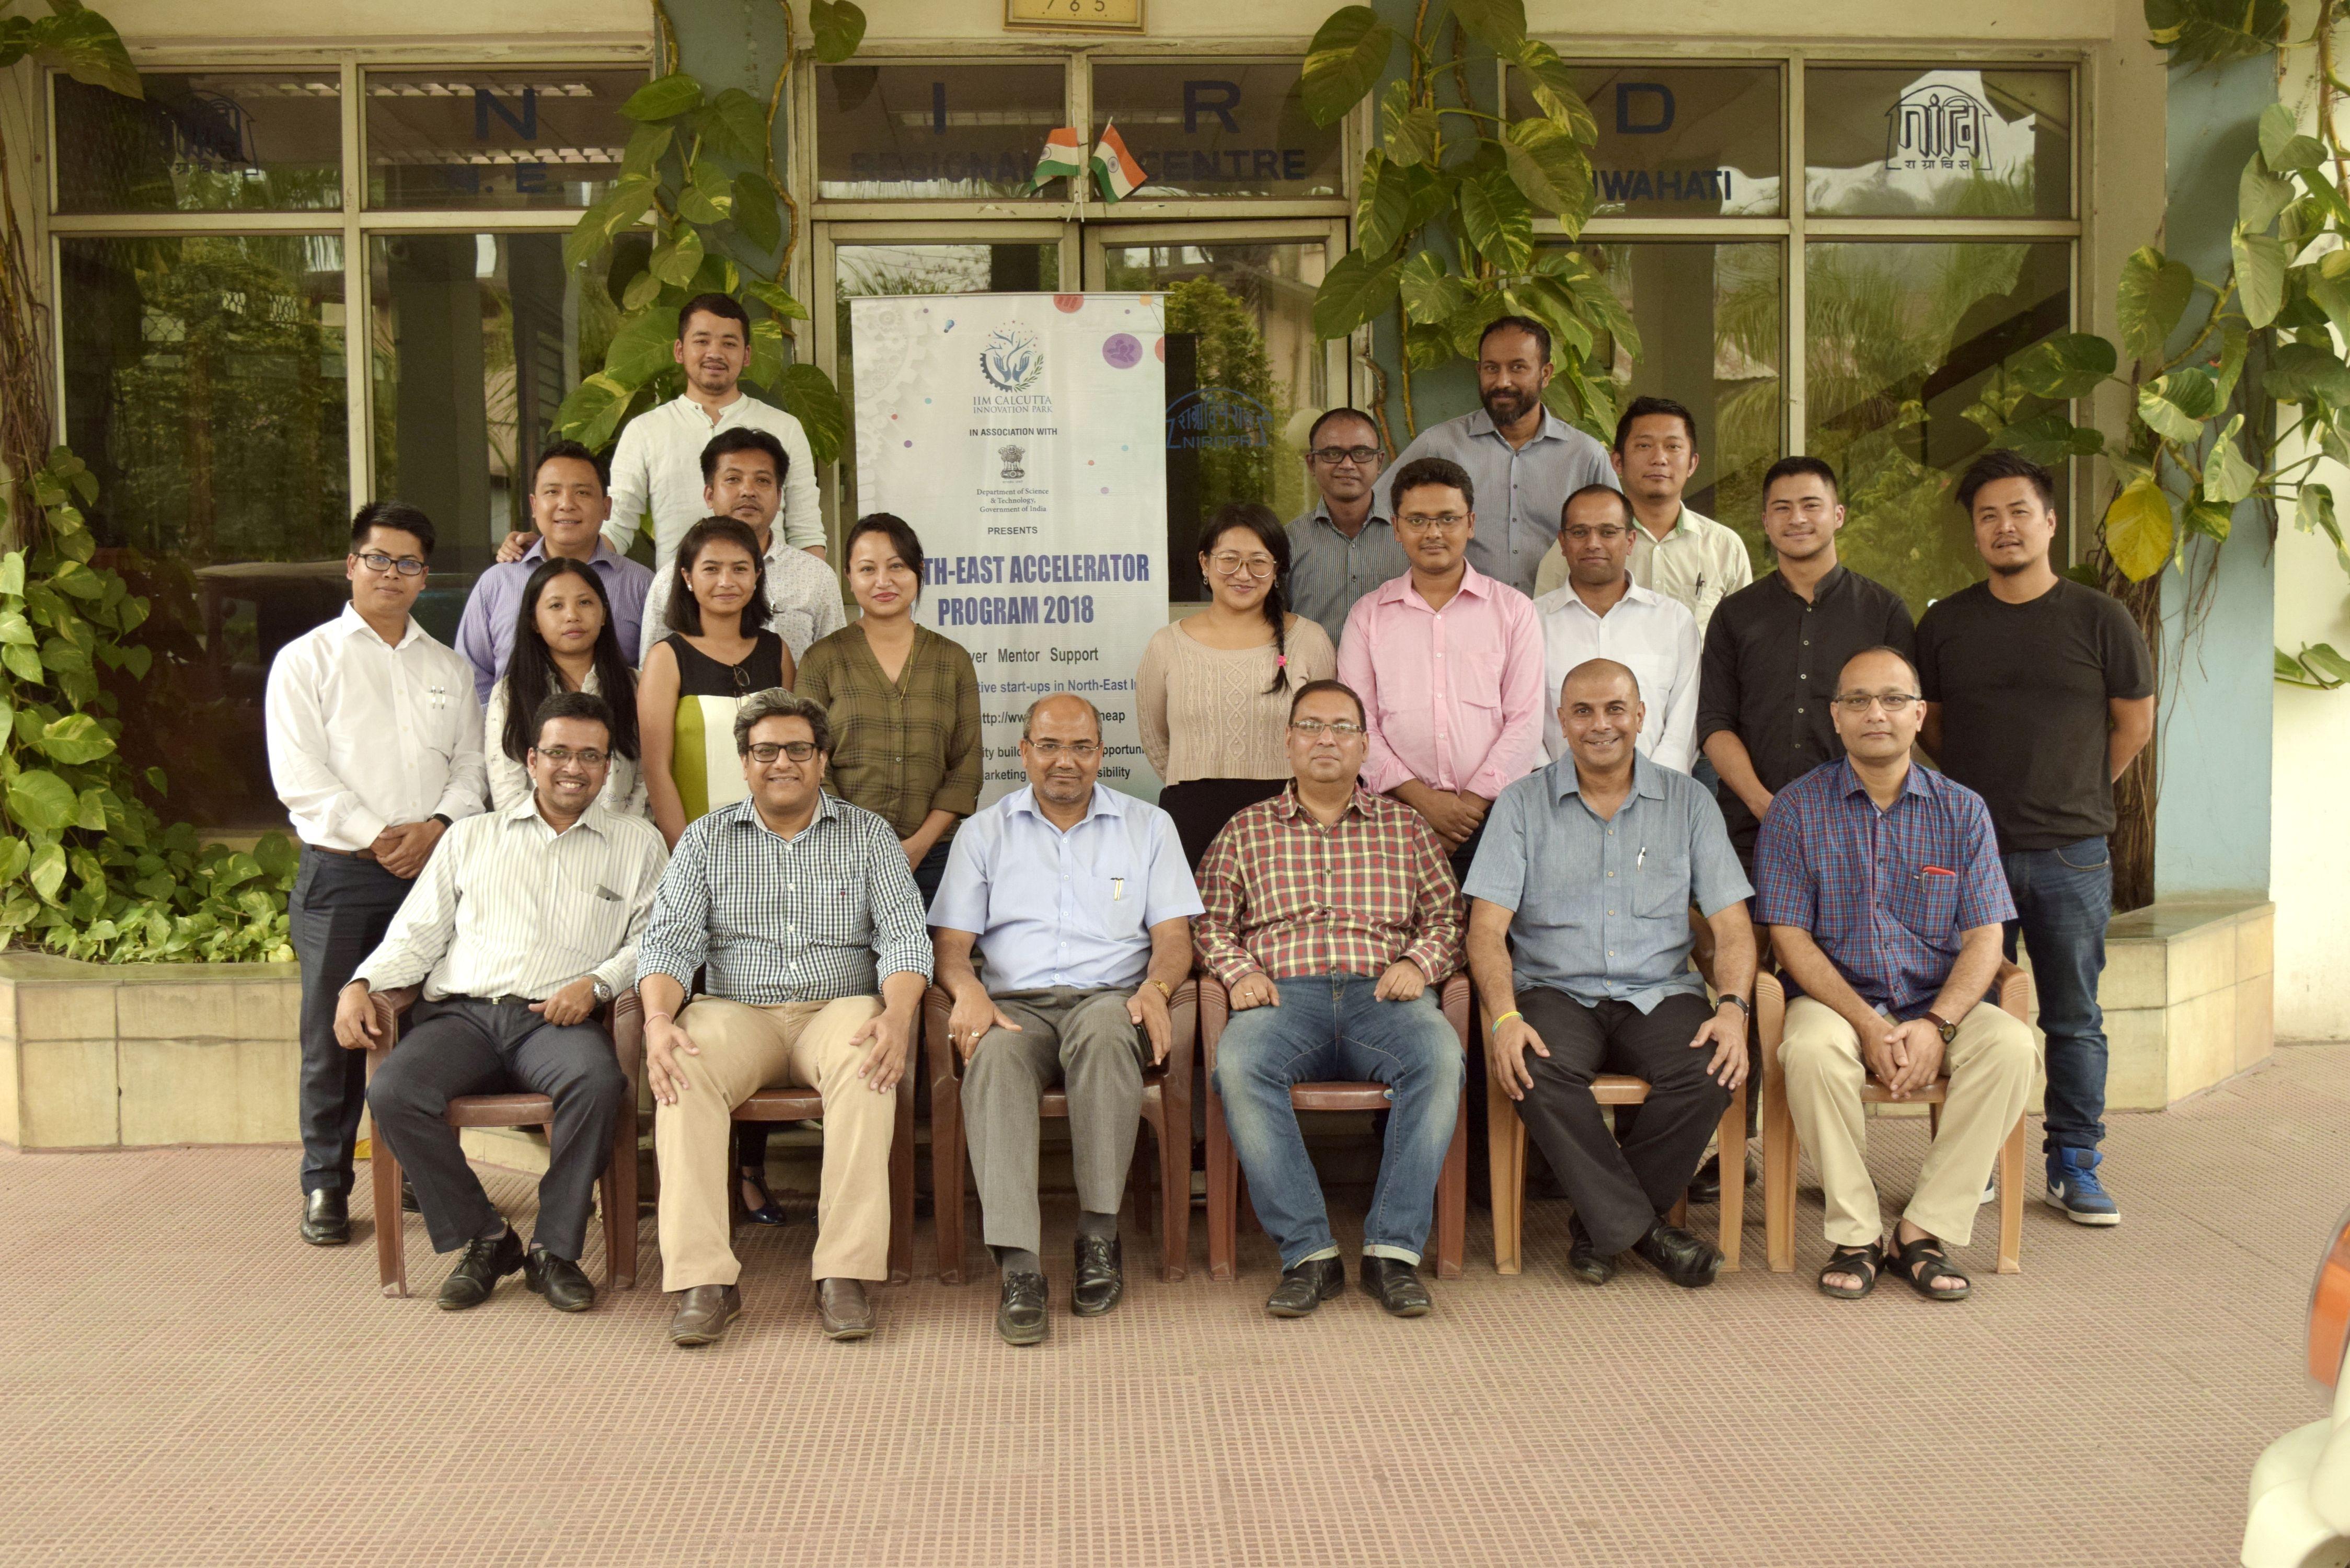 North East Accelerator Program (NEAP)